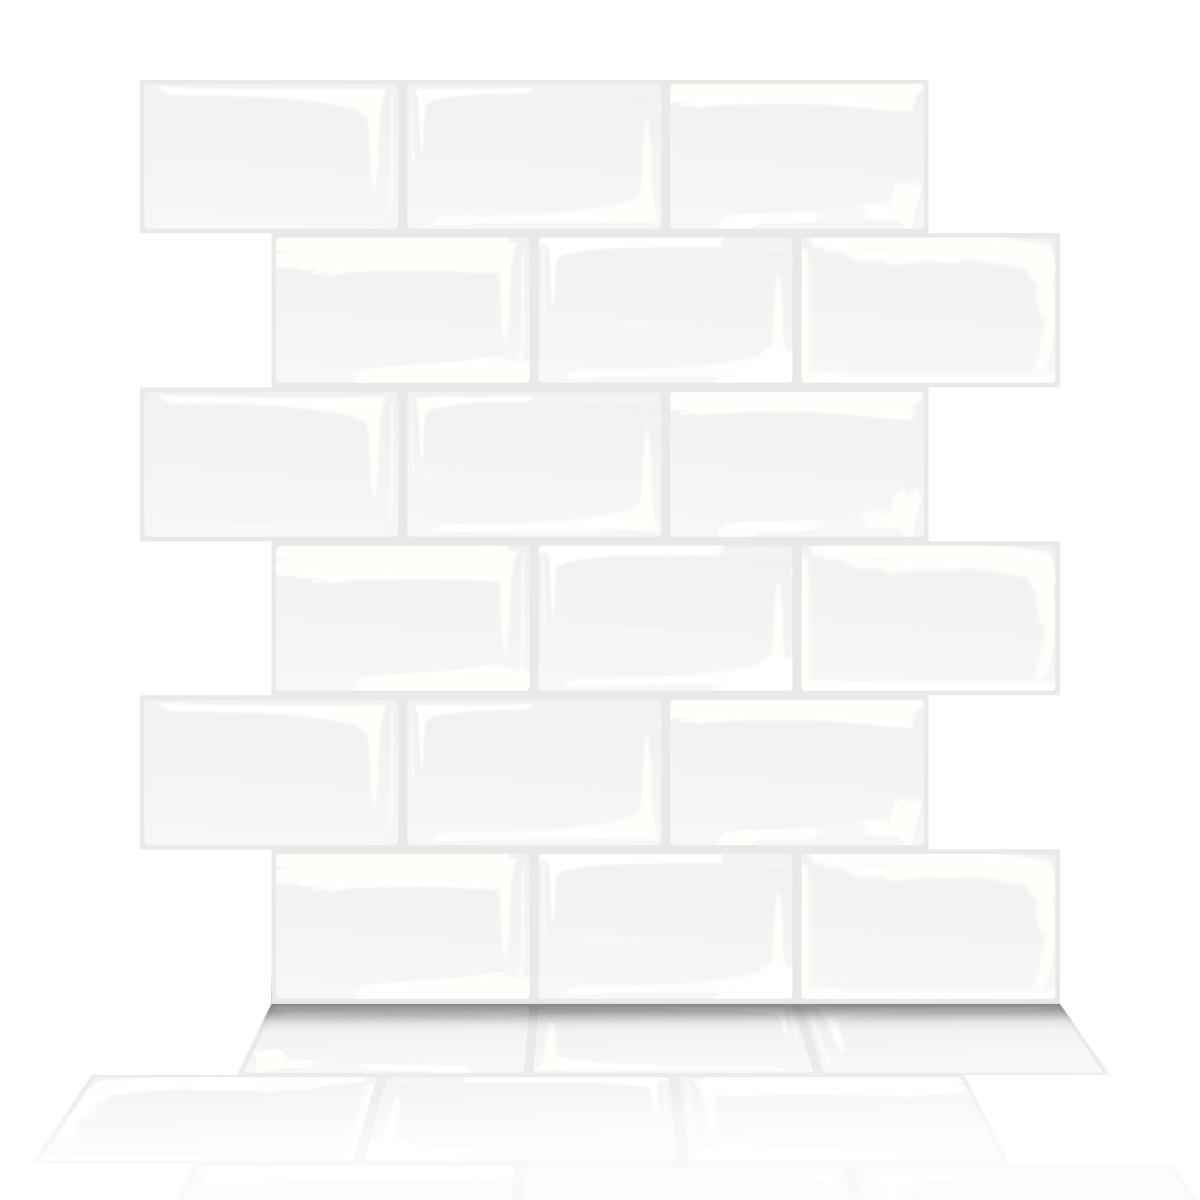 A17700-Art3d Subway Tiles Peel and Stick Backsplash, Stick on Tiles Kitchen Backsplash